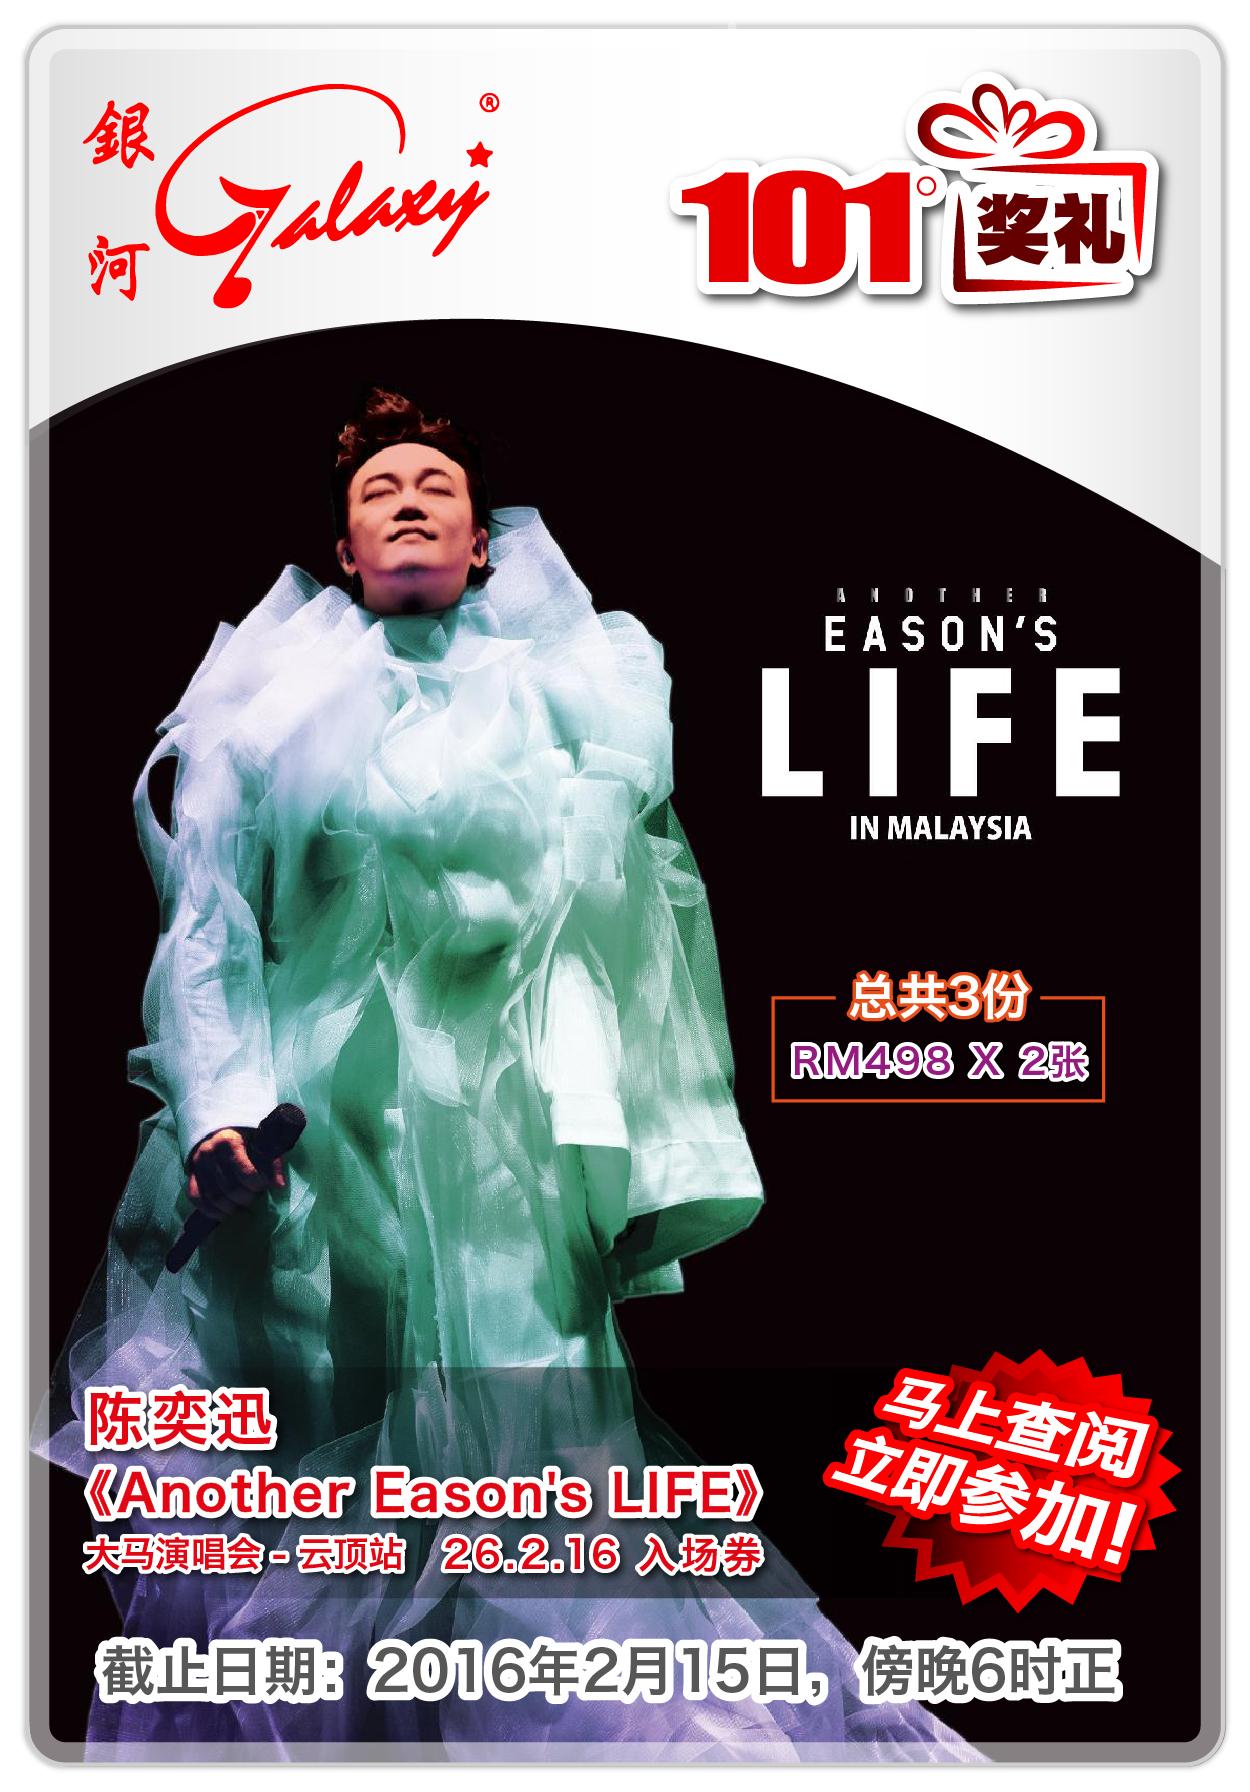 101奖礼 #60 – 陈奕迅《Another Eason's LIFE演唱会 – 大马站》